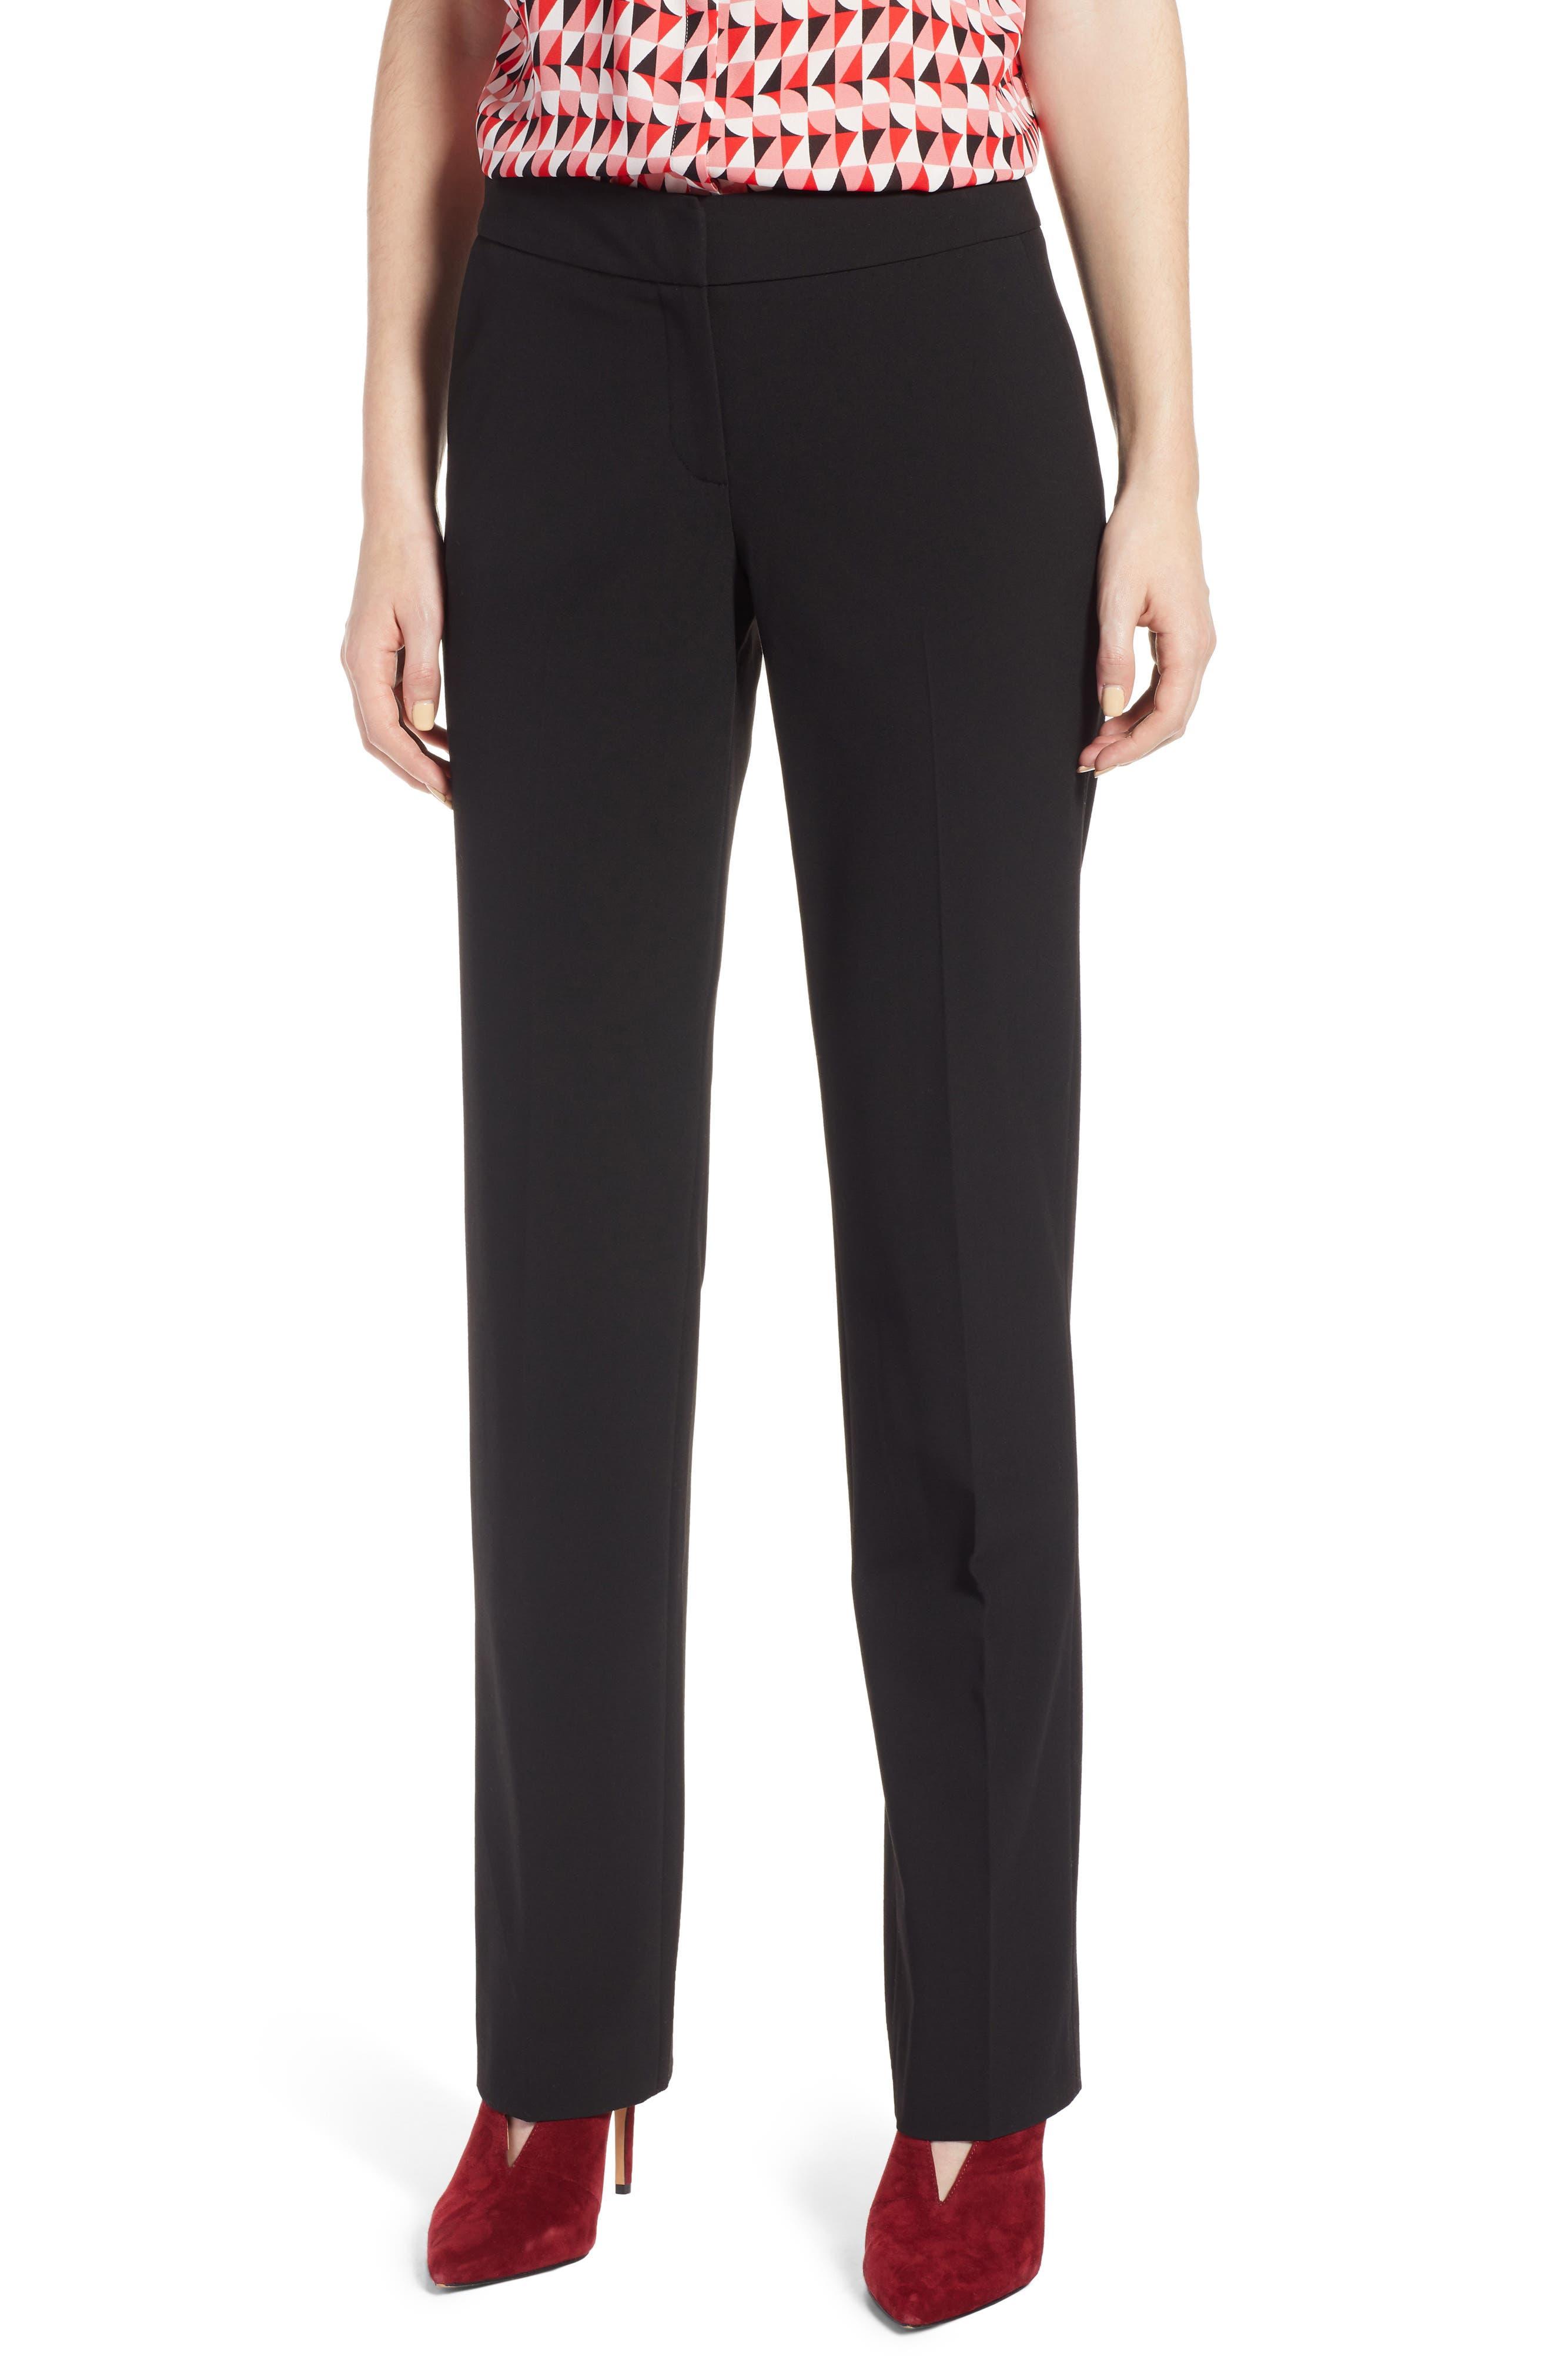 Stovepipe Pants,                         Main,                         color, Black